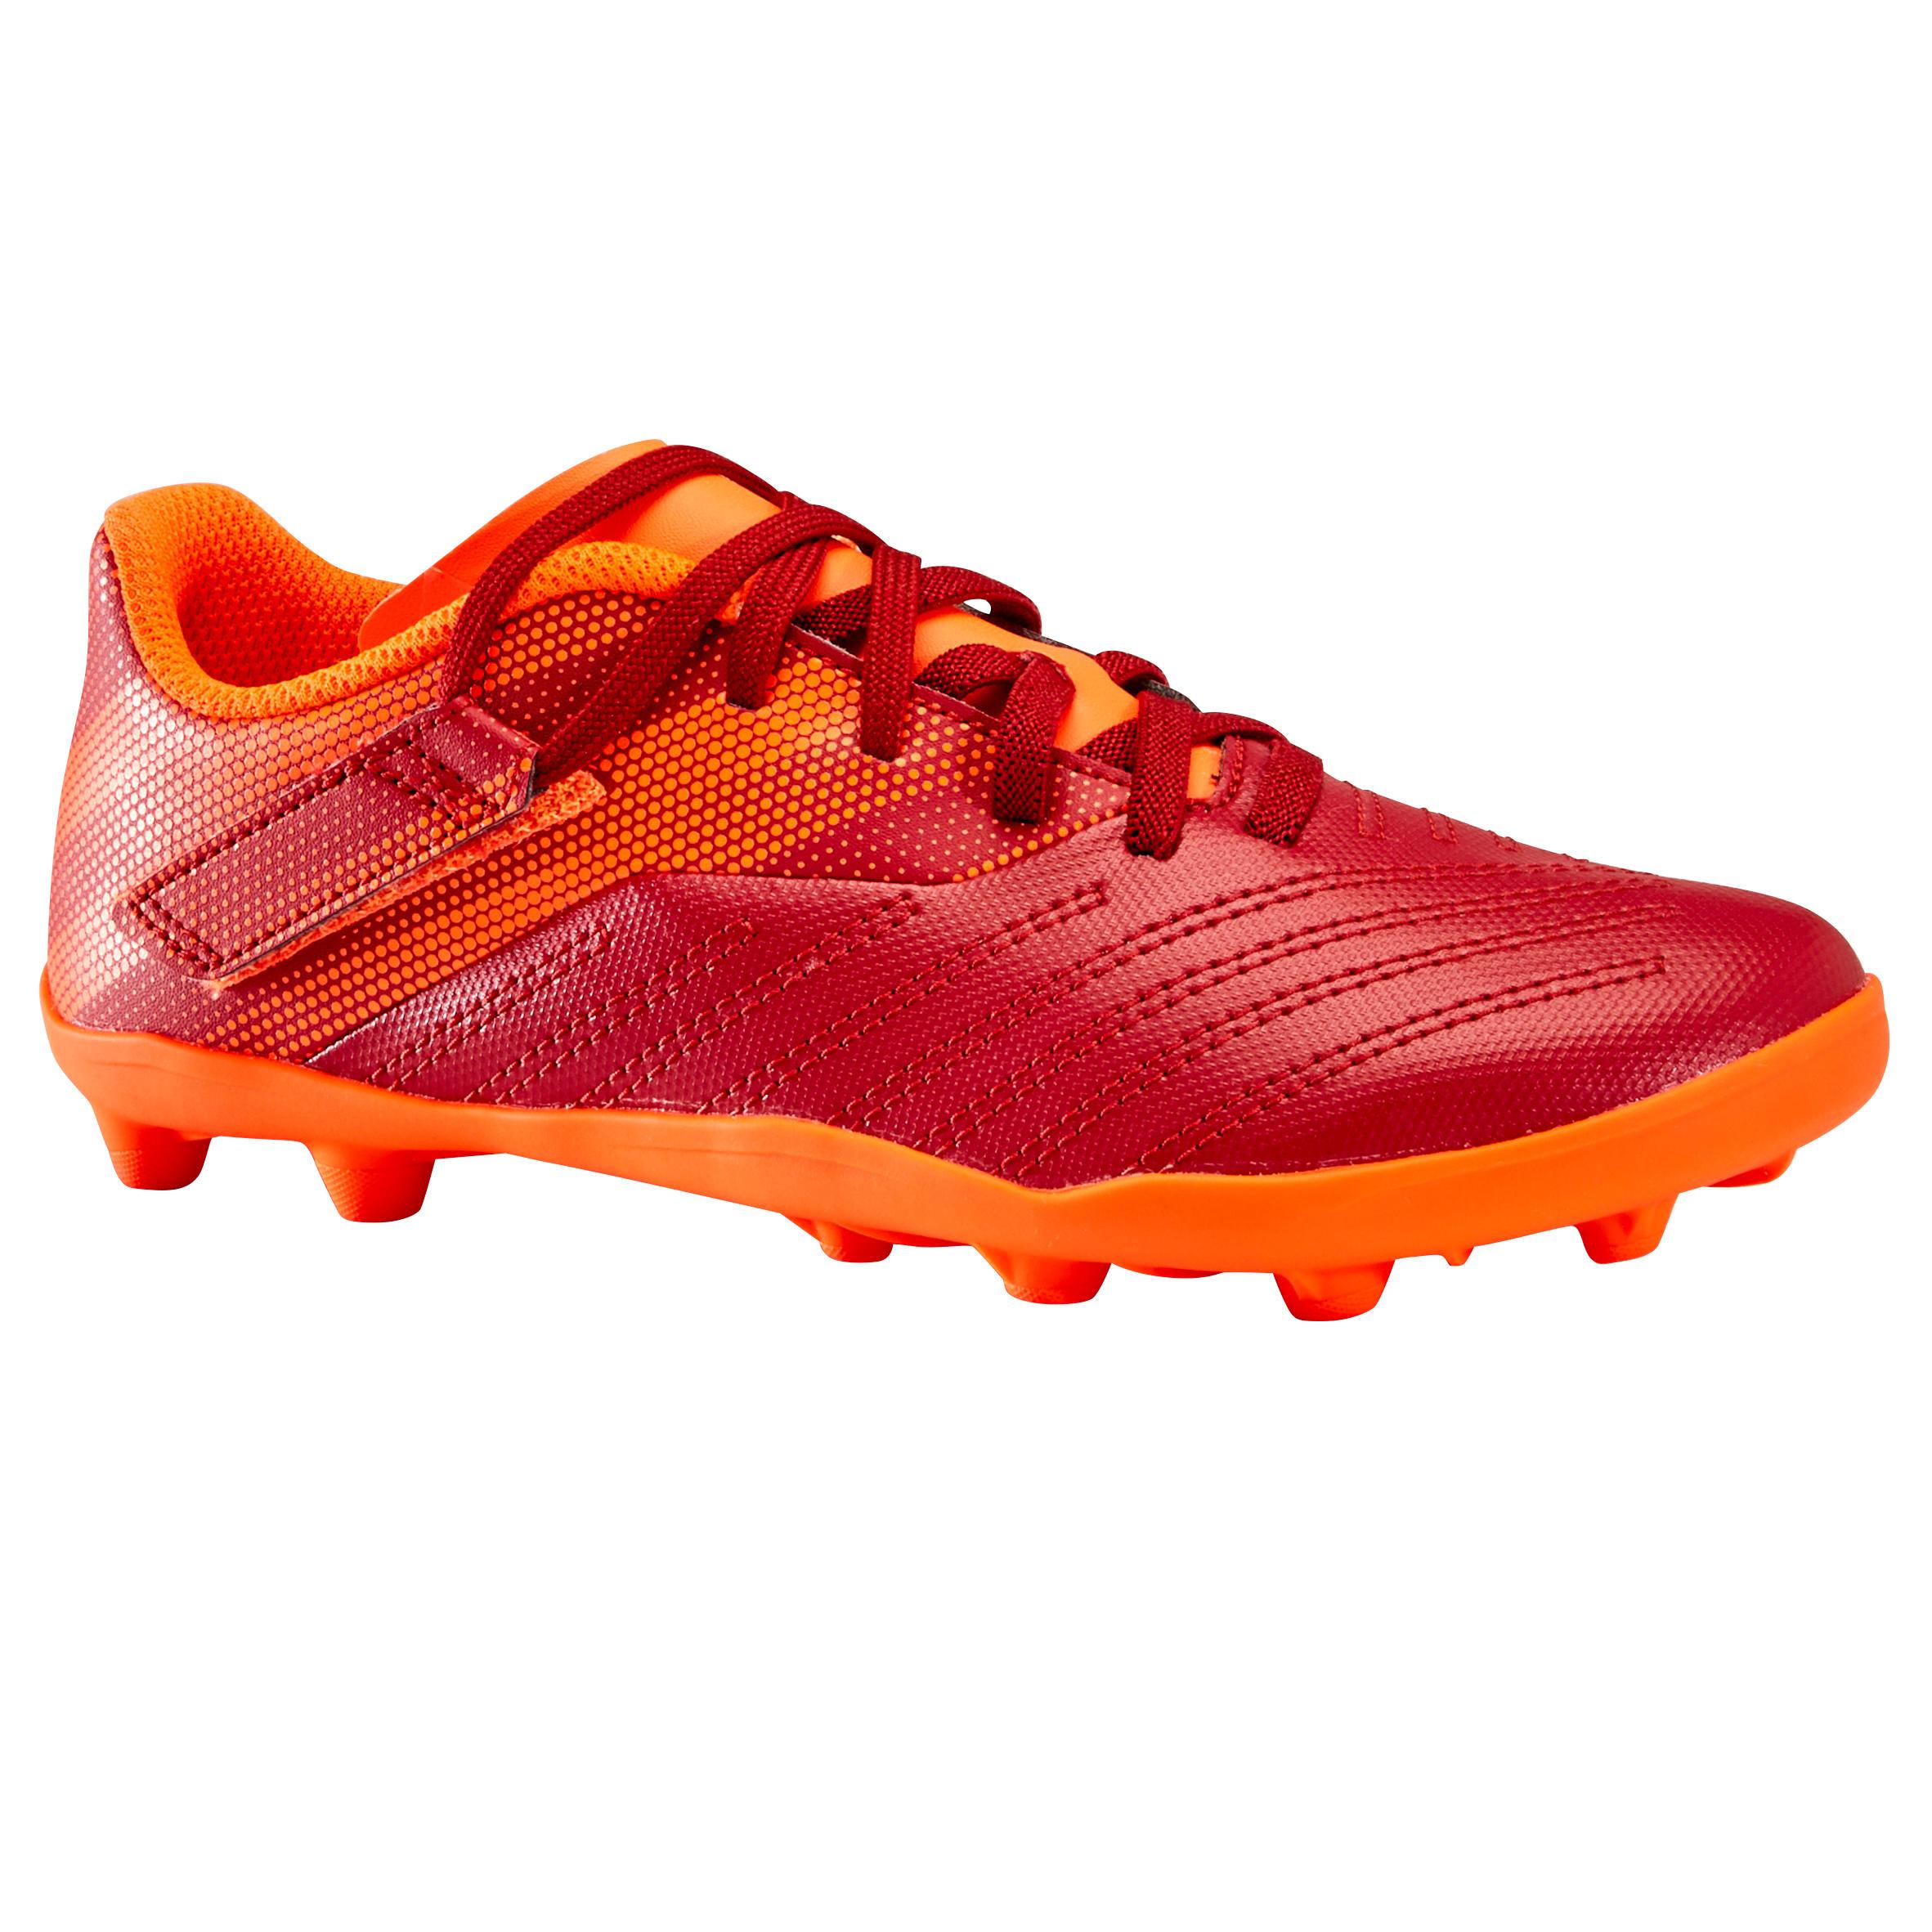 kids orange soccer cleats